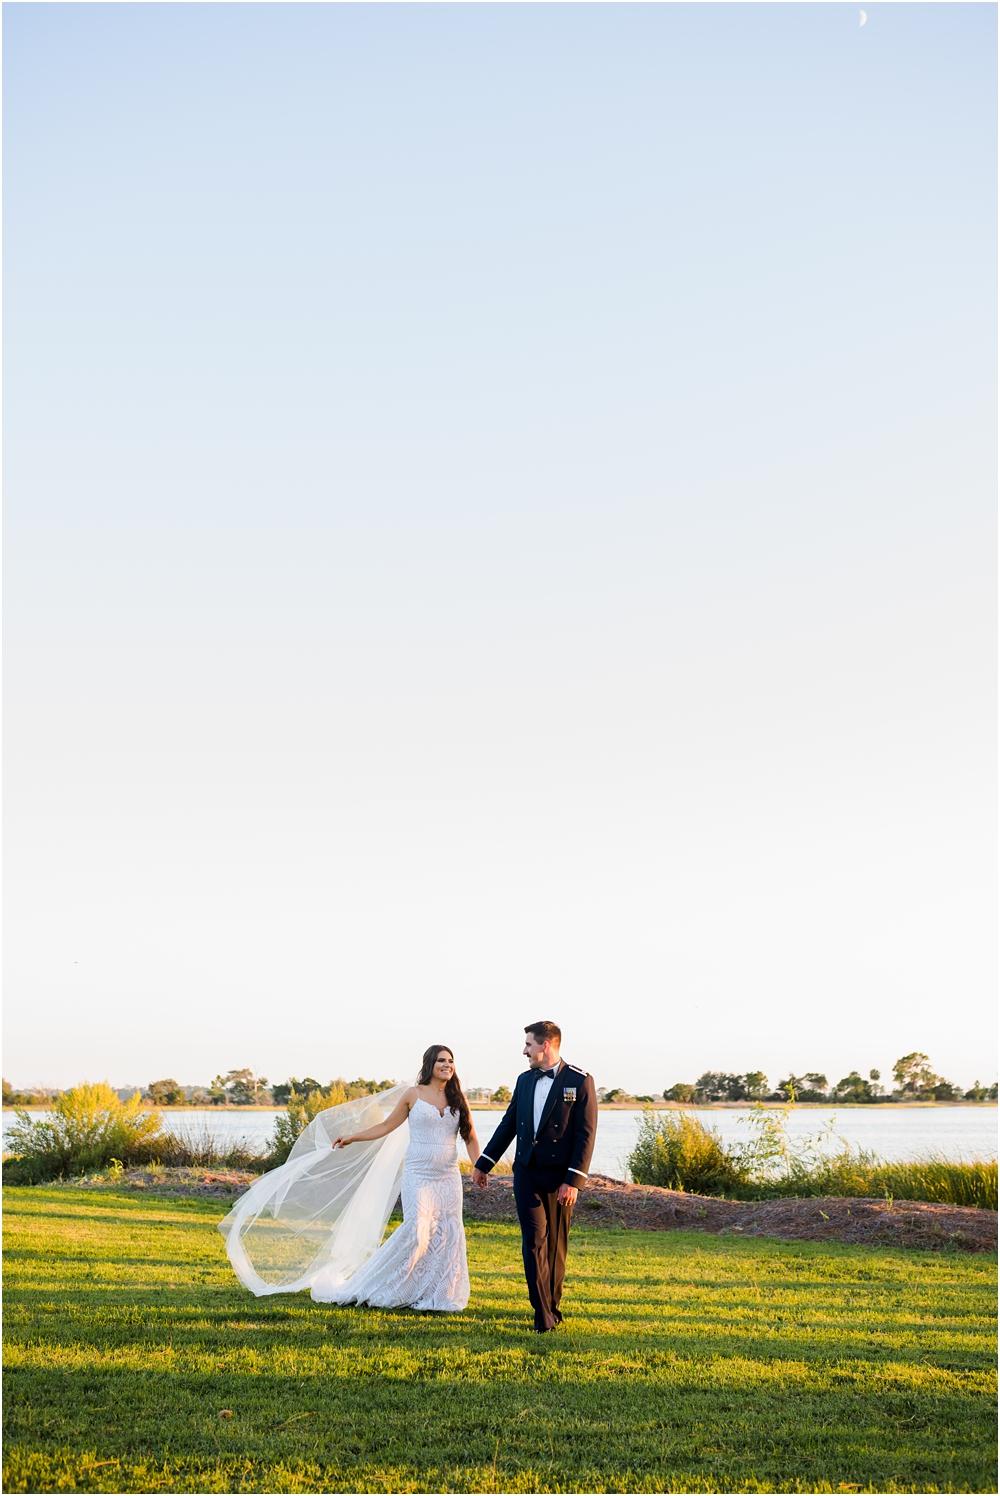 amack-wedding-kiersten-stevenson-photography-30a-panama-city-beach-dothan-tallahassee-(523-of-882).JPG